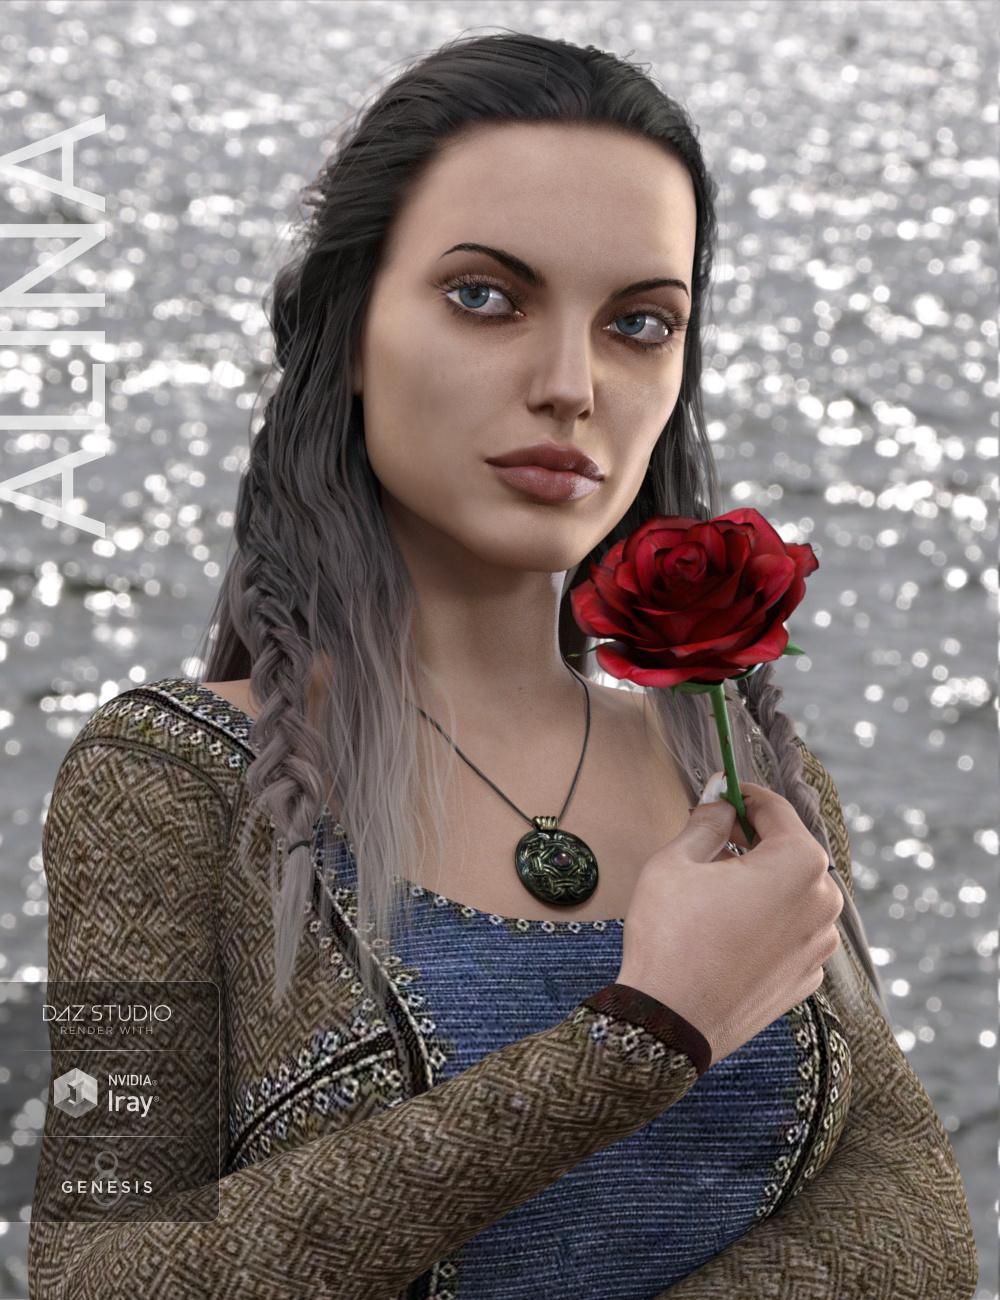 Alina for Genesis 8 Female by: Vyusur, 3D Models by Daz 3D